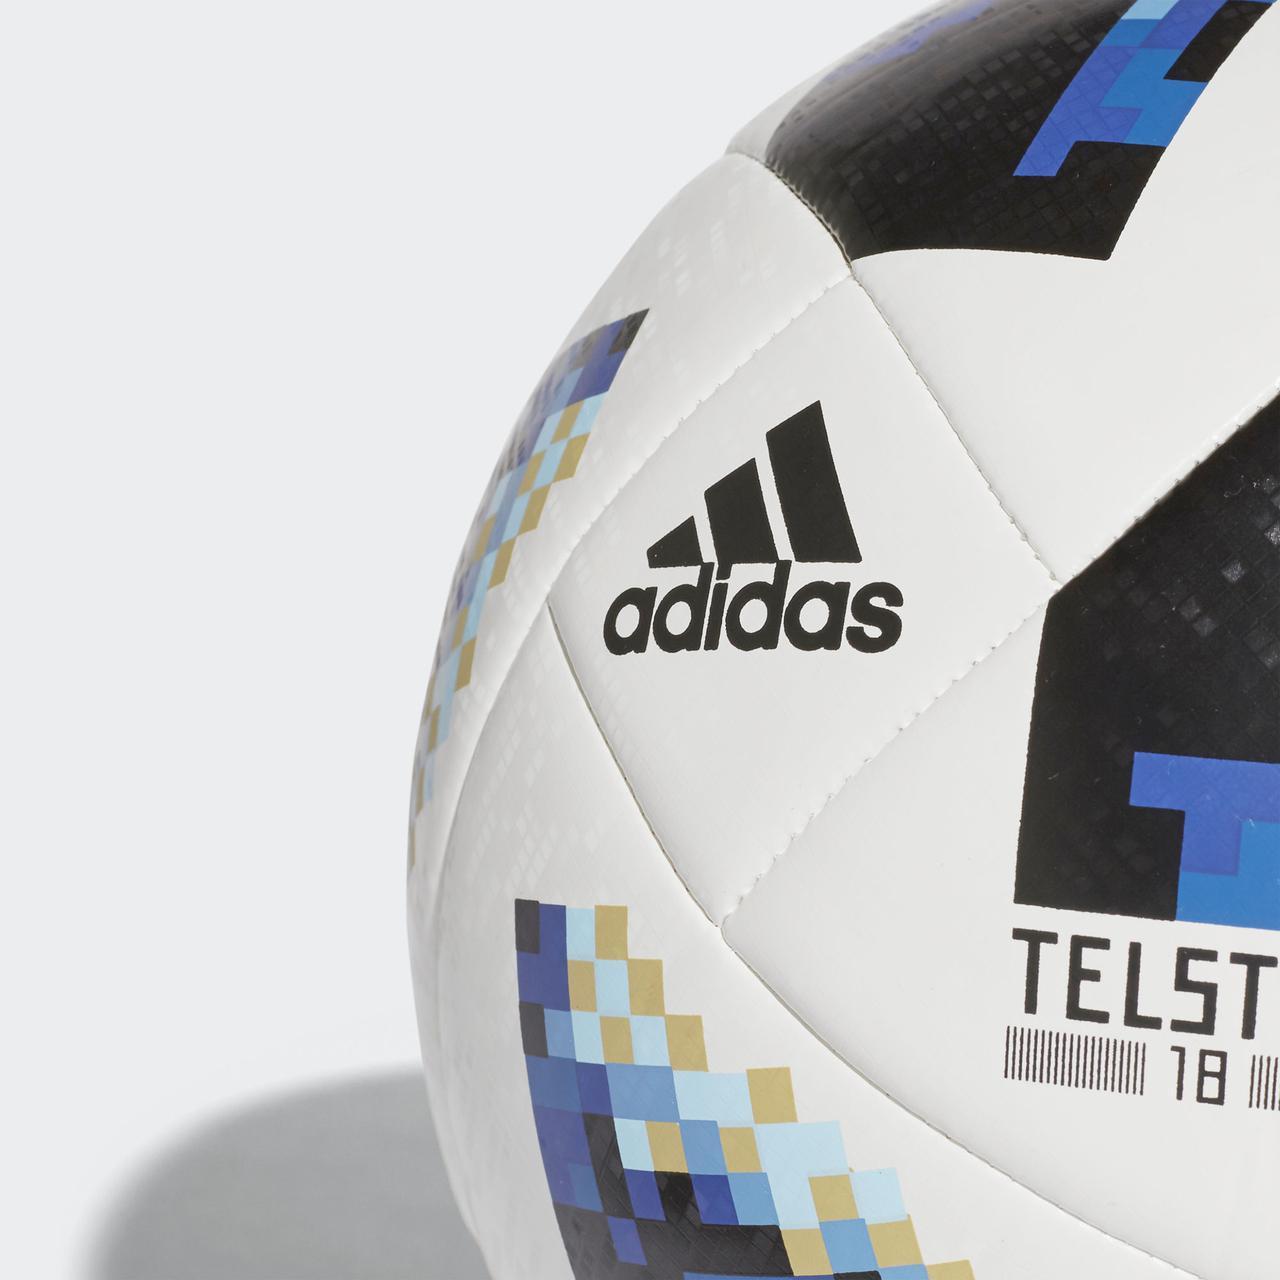 da9ca33e3365 Футбольный мяч Аргентина FIFA World Cup  продажа, цена в Харькове ...